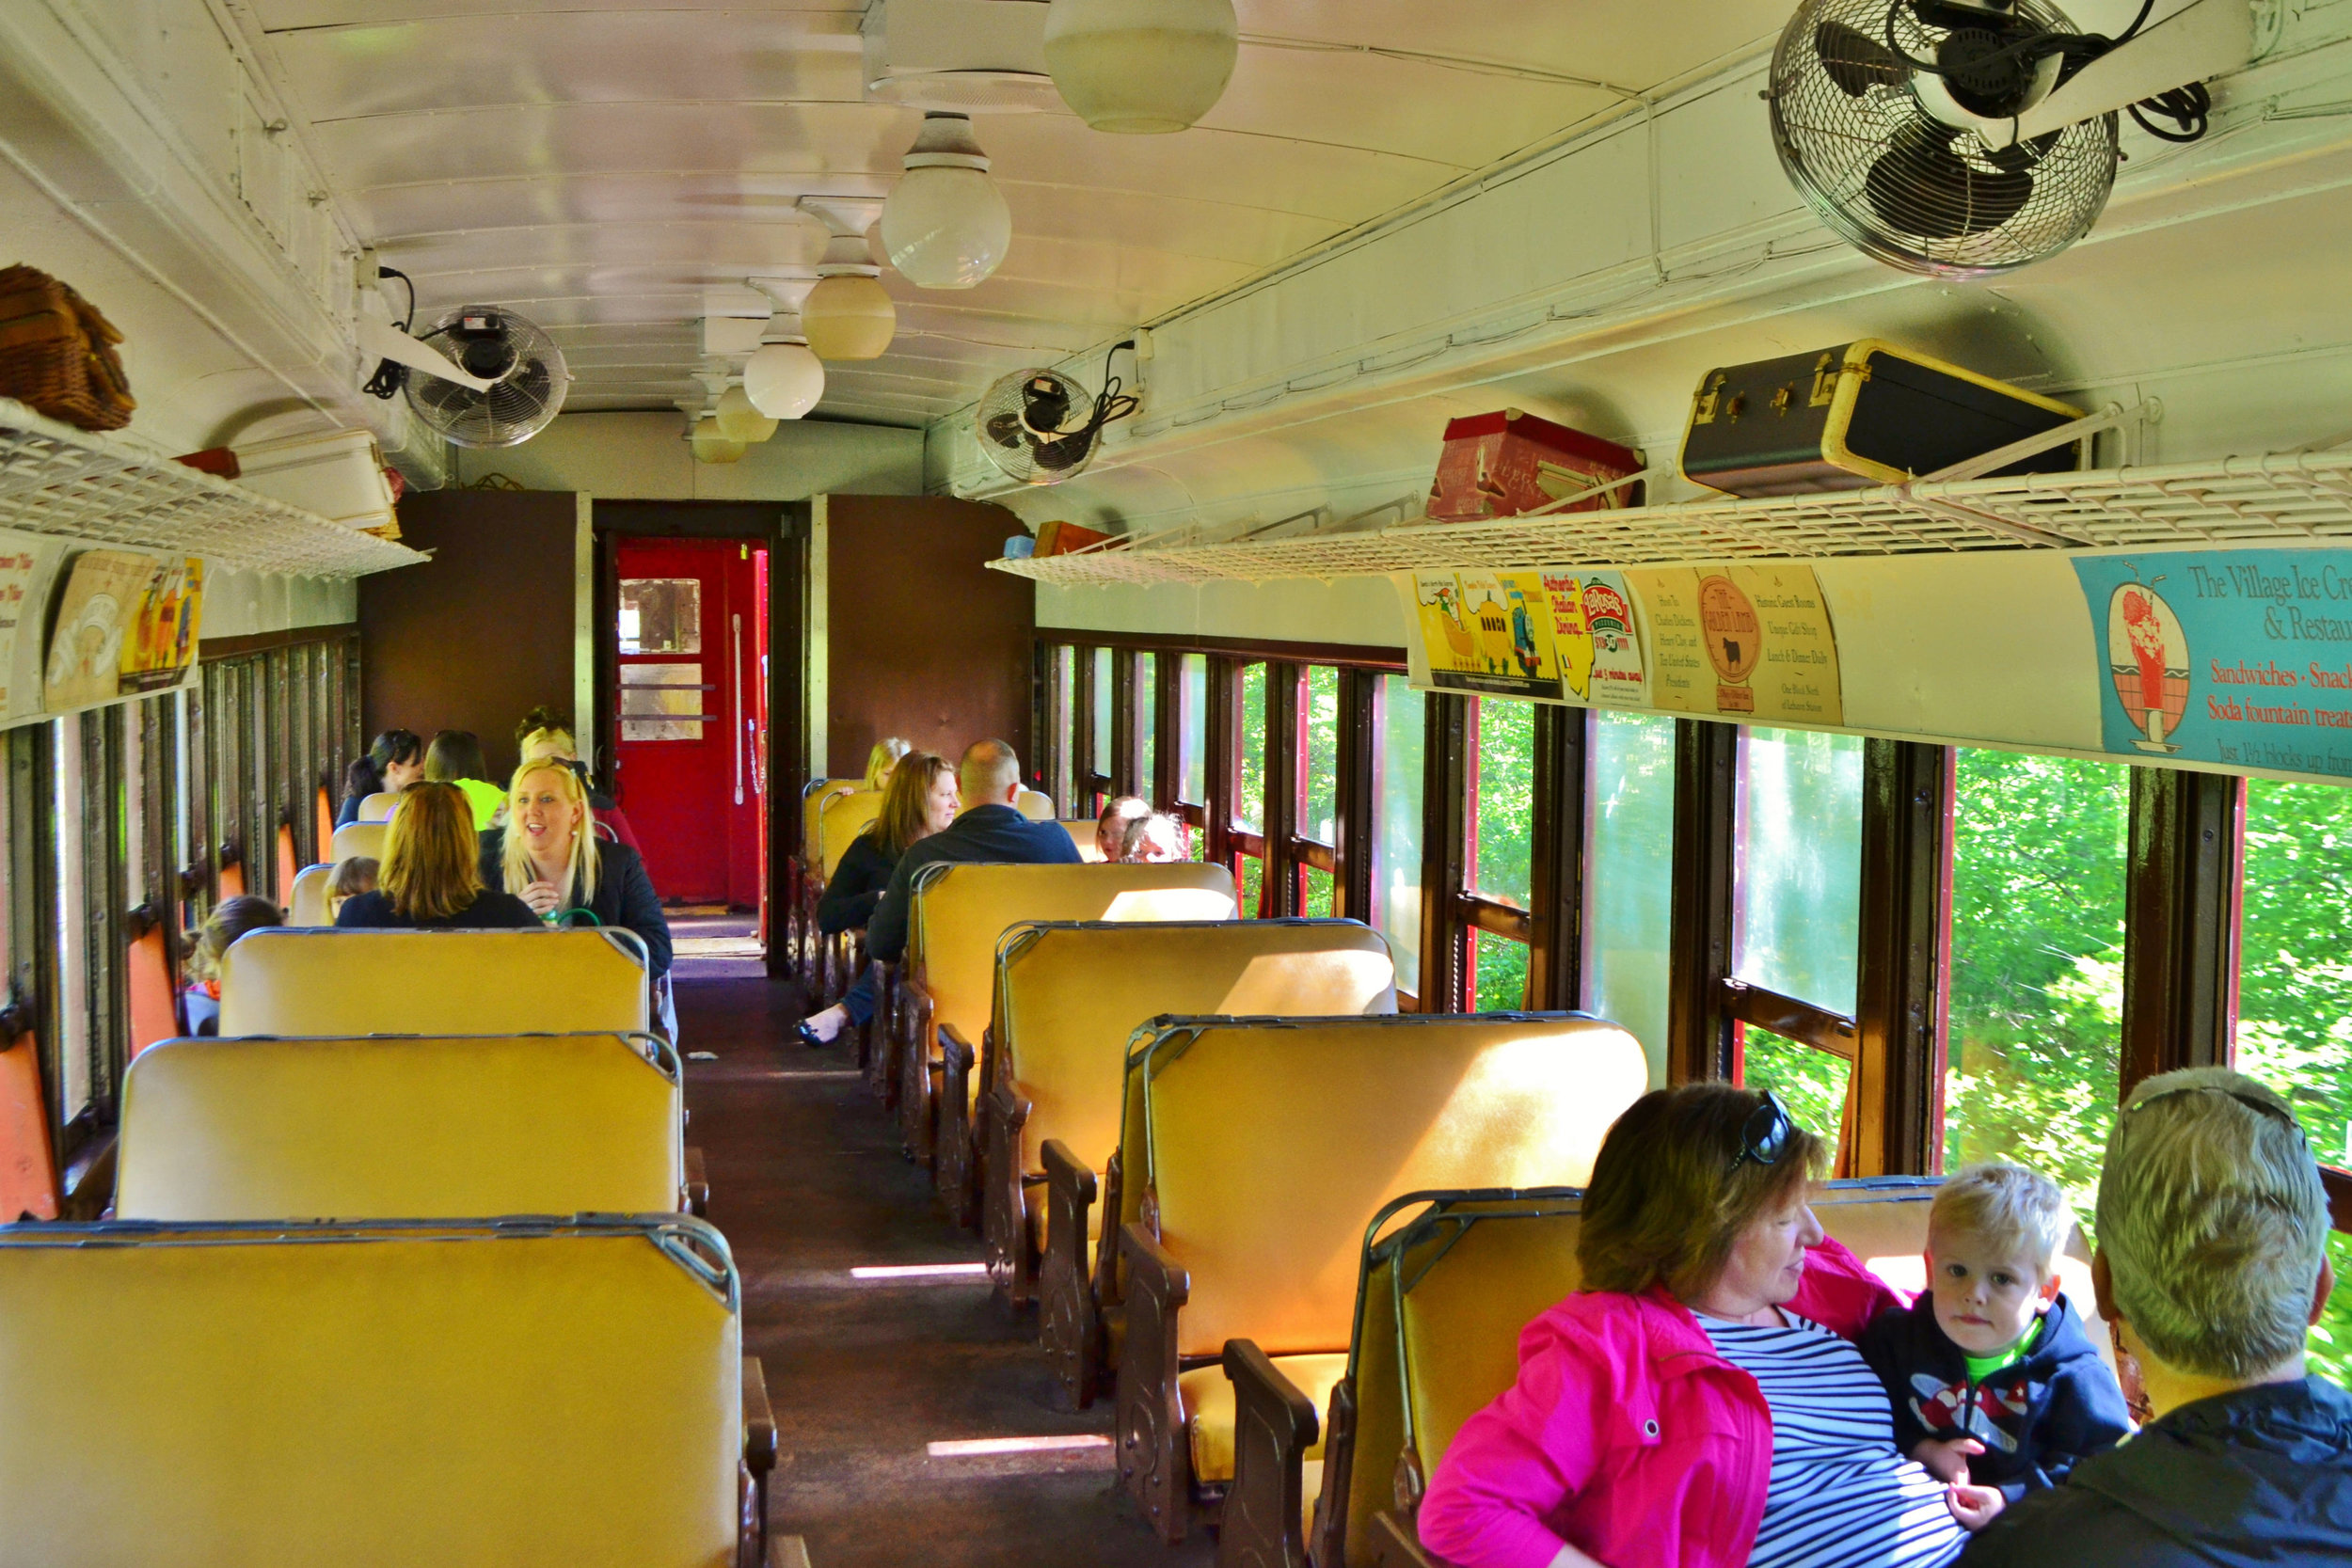 Lackawanna coach interior